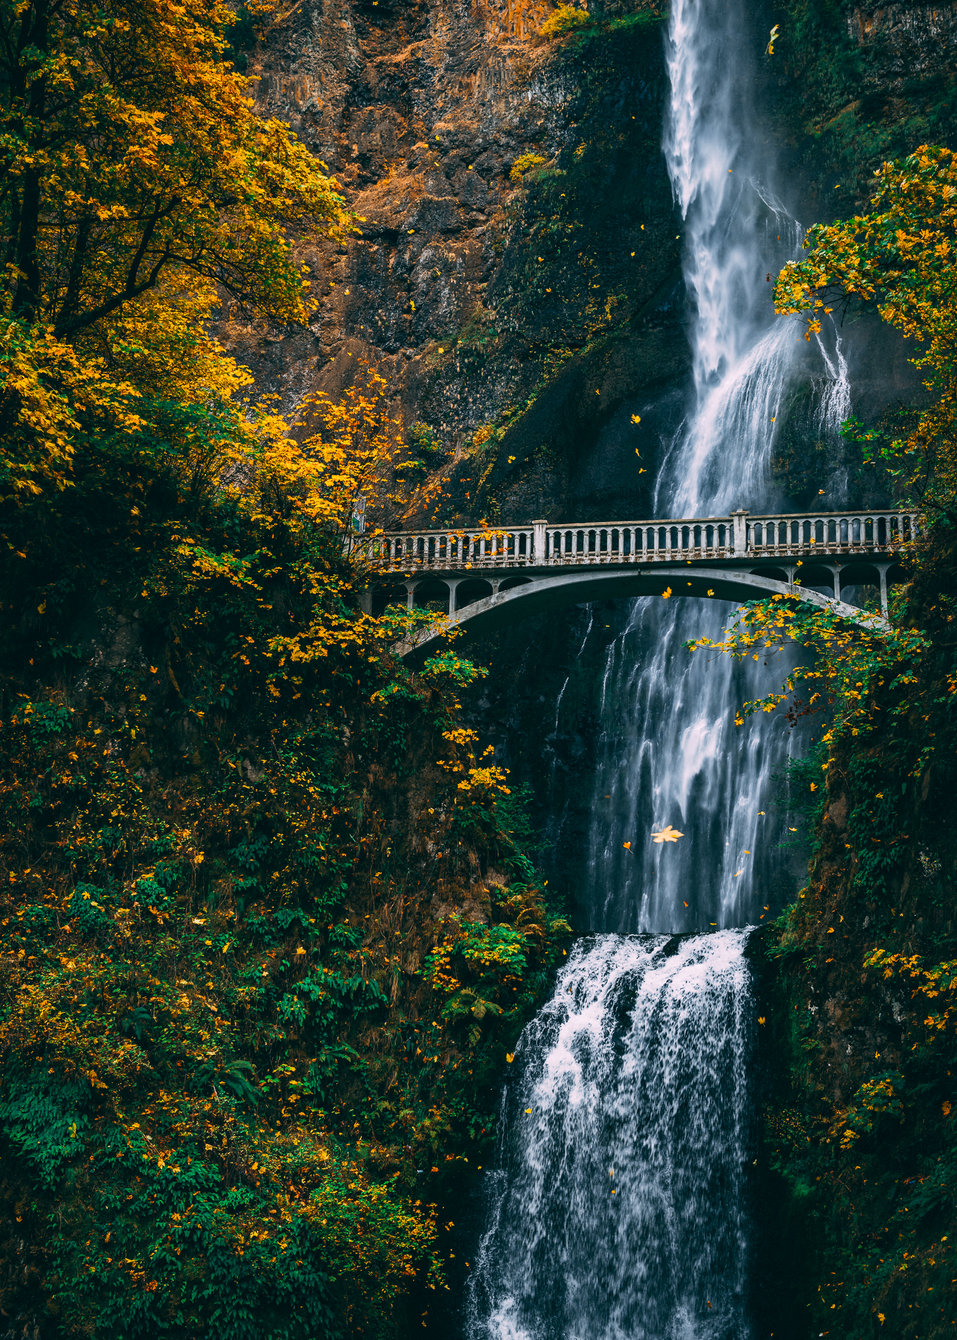 Maltnomah falls